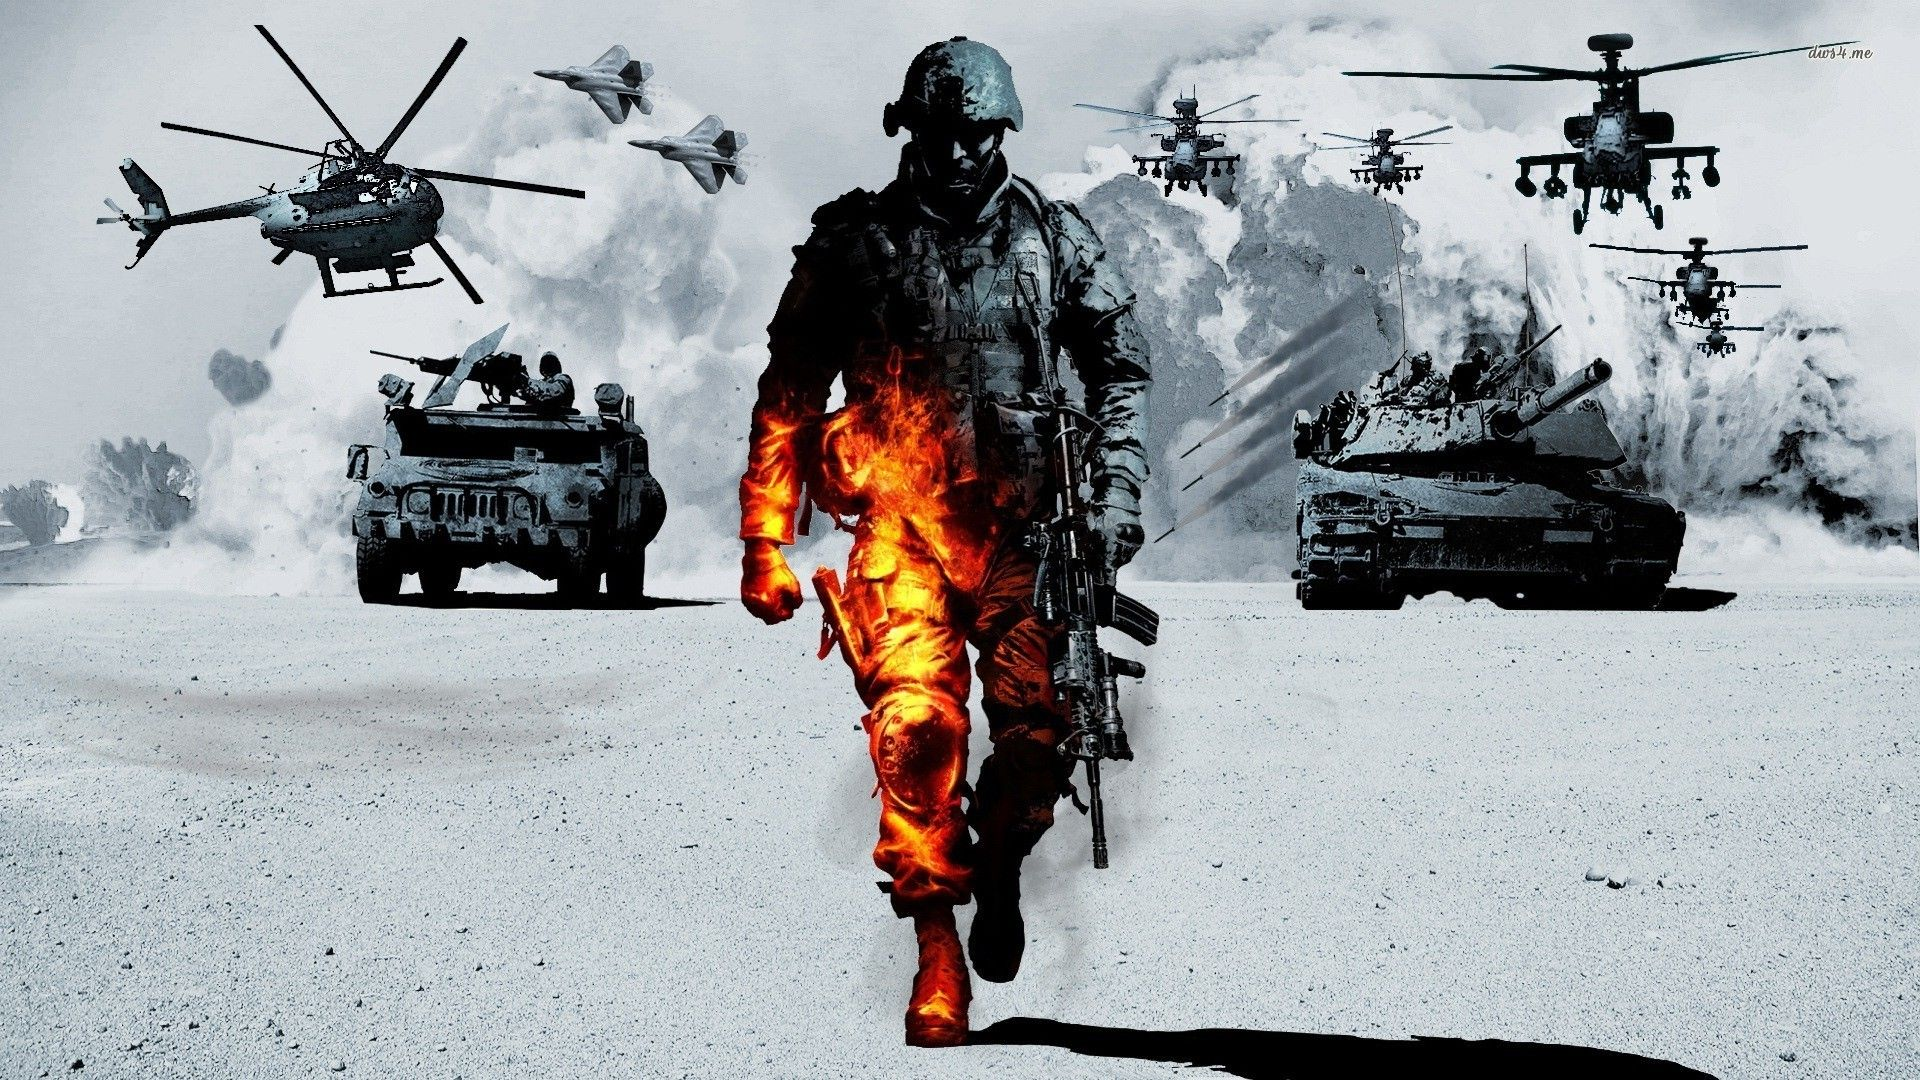 Battlefield 2 Wallpapers Top Free Battlefield 2 Backgrounds